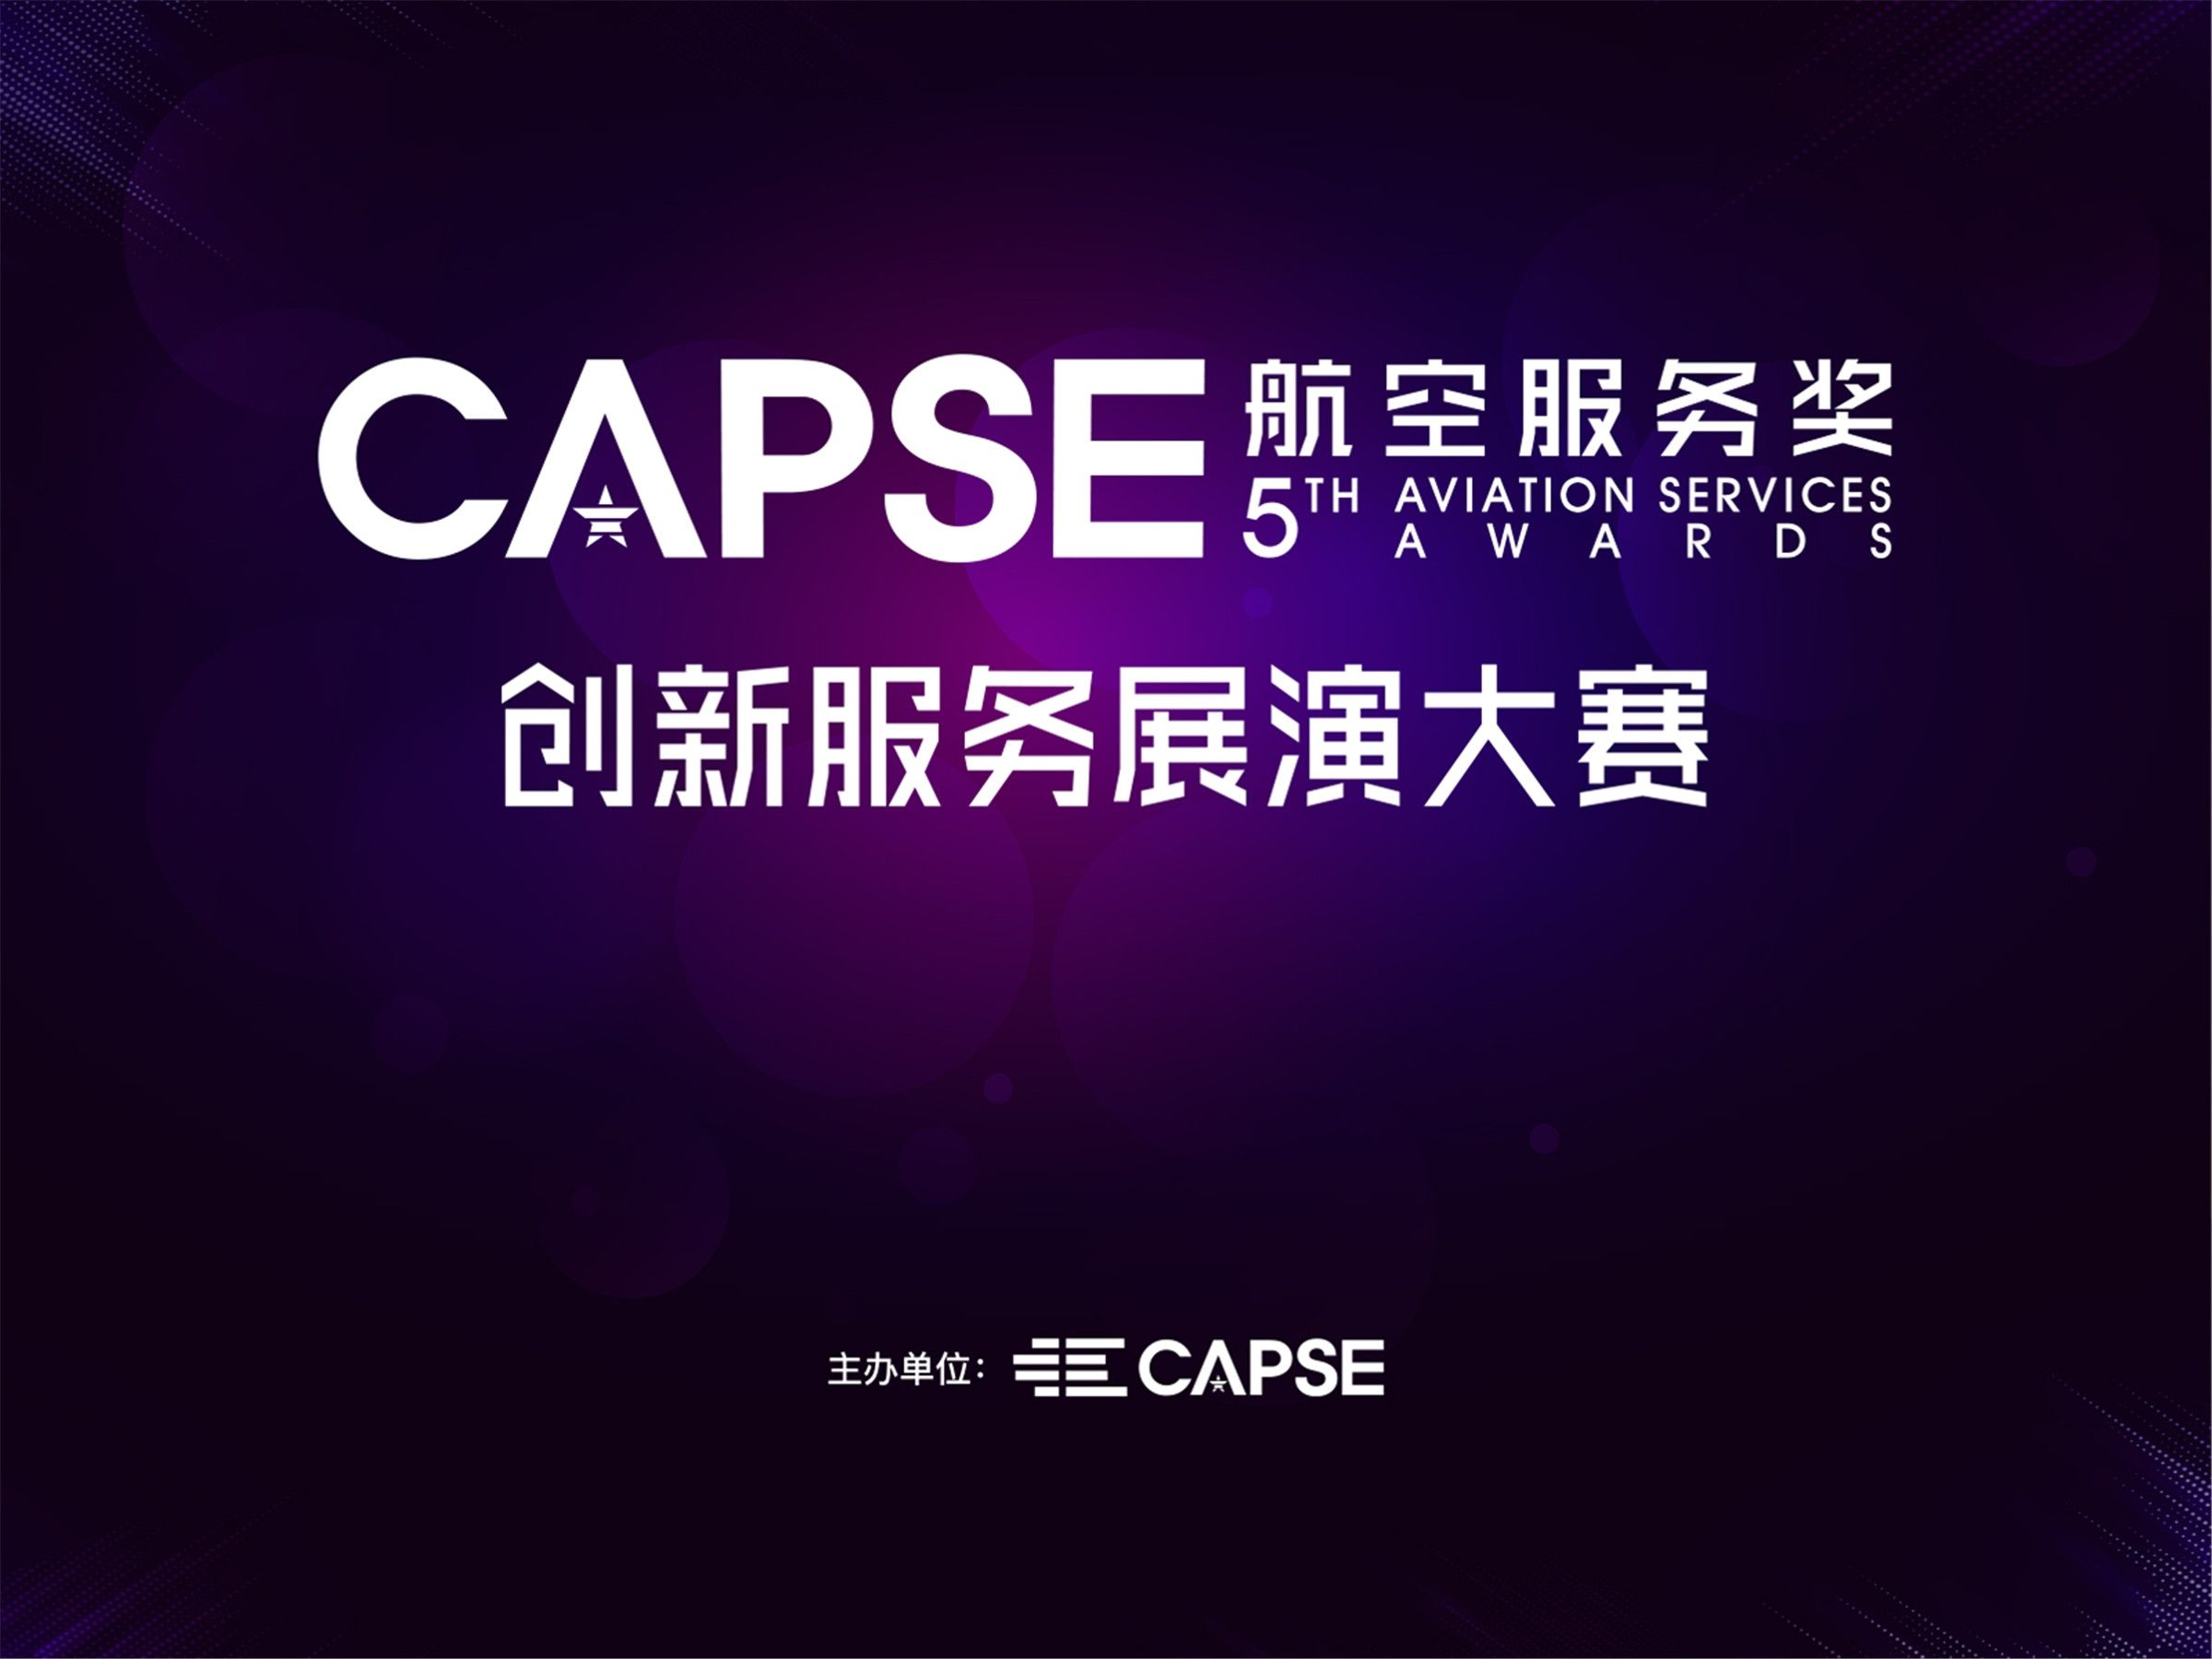 CAPSE举办创新服务展演大赛 八家民航实体夺得桂冠